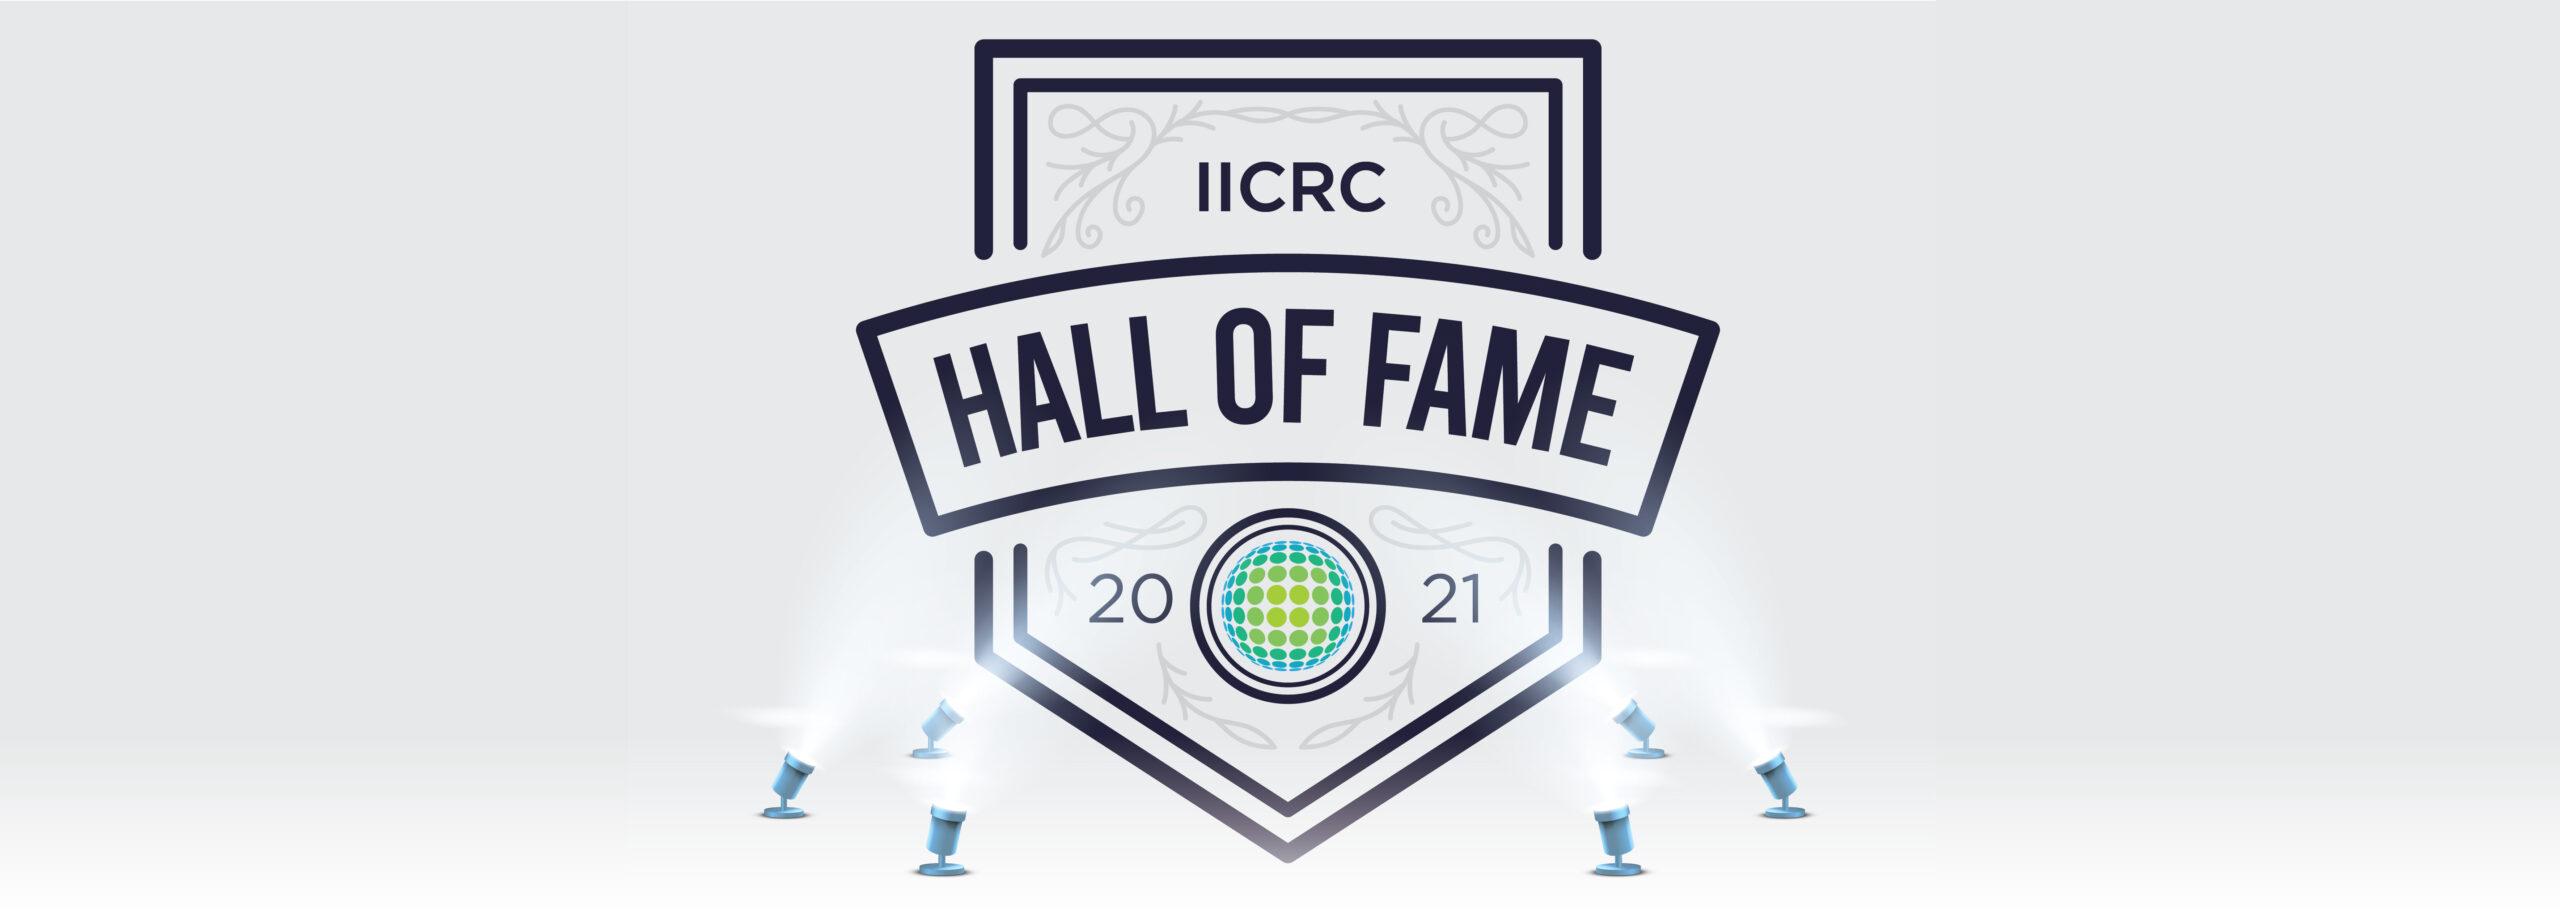 IICRC Hall of Fame 2021 page header